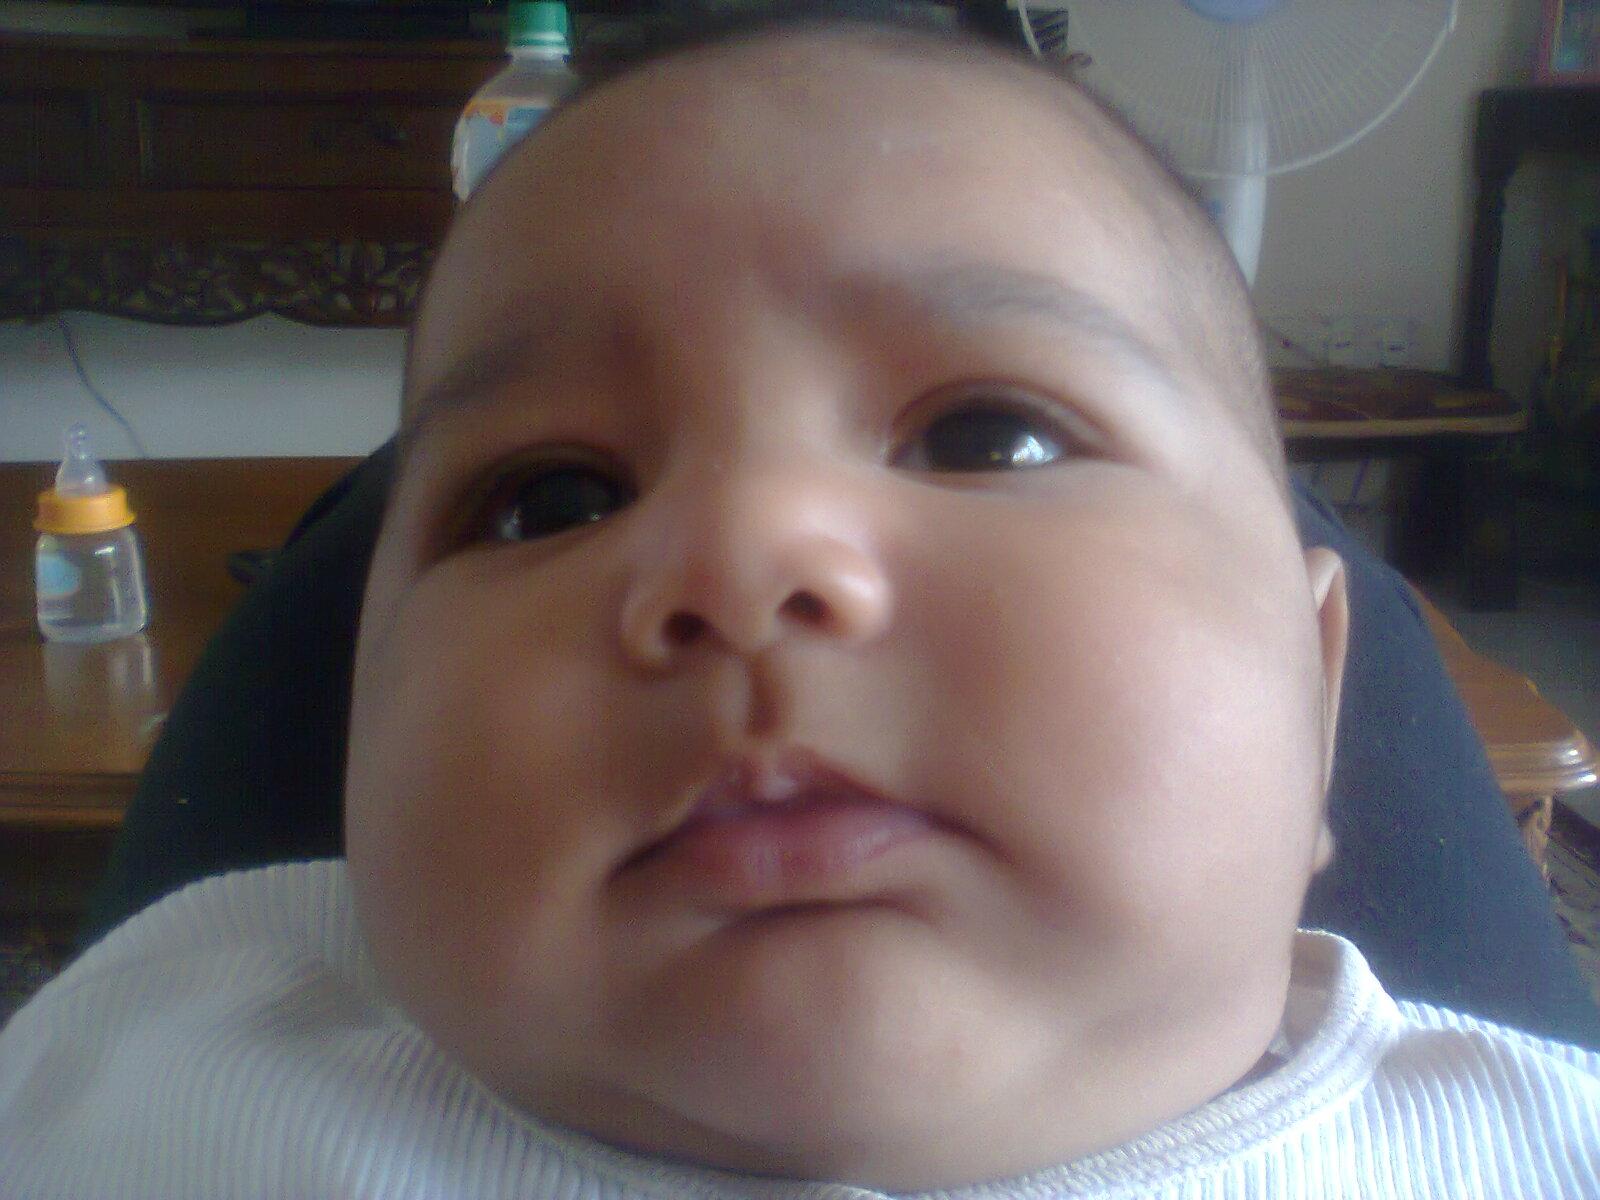 Macam-macam ADE!!: PERLU KE NEW BORN BABY BERSUNAT???